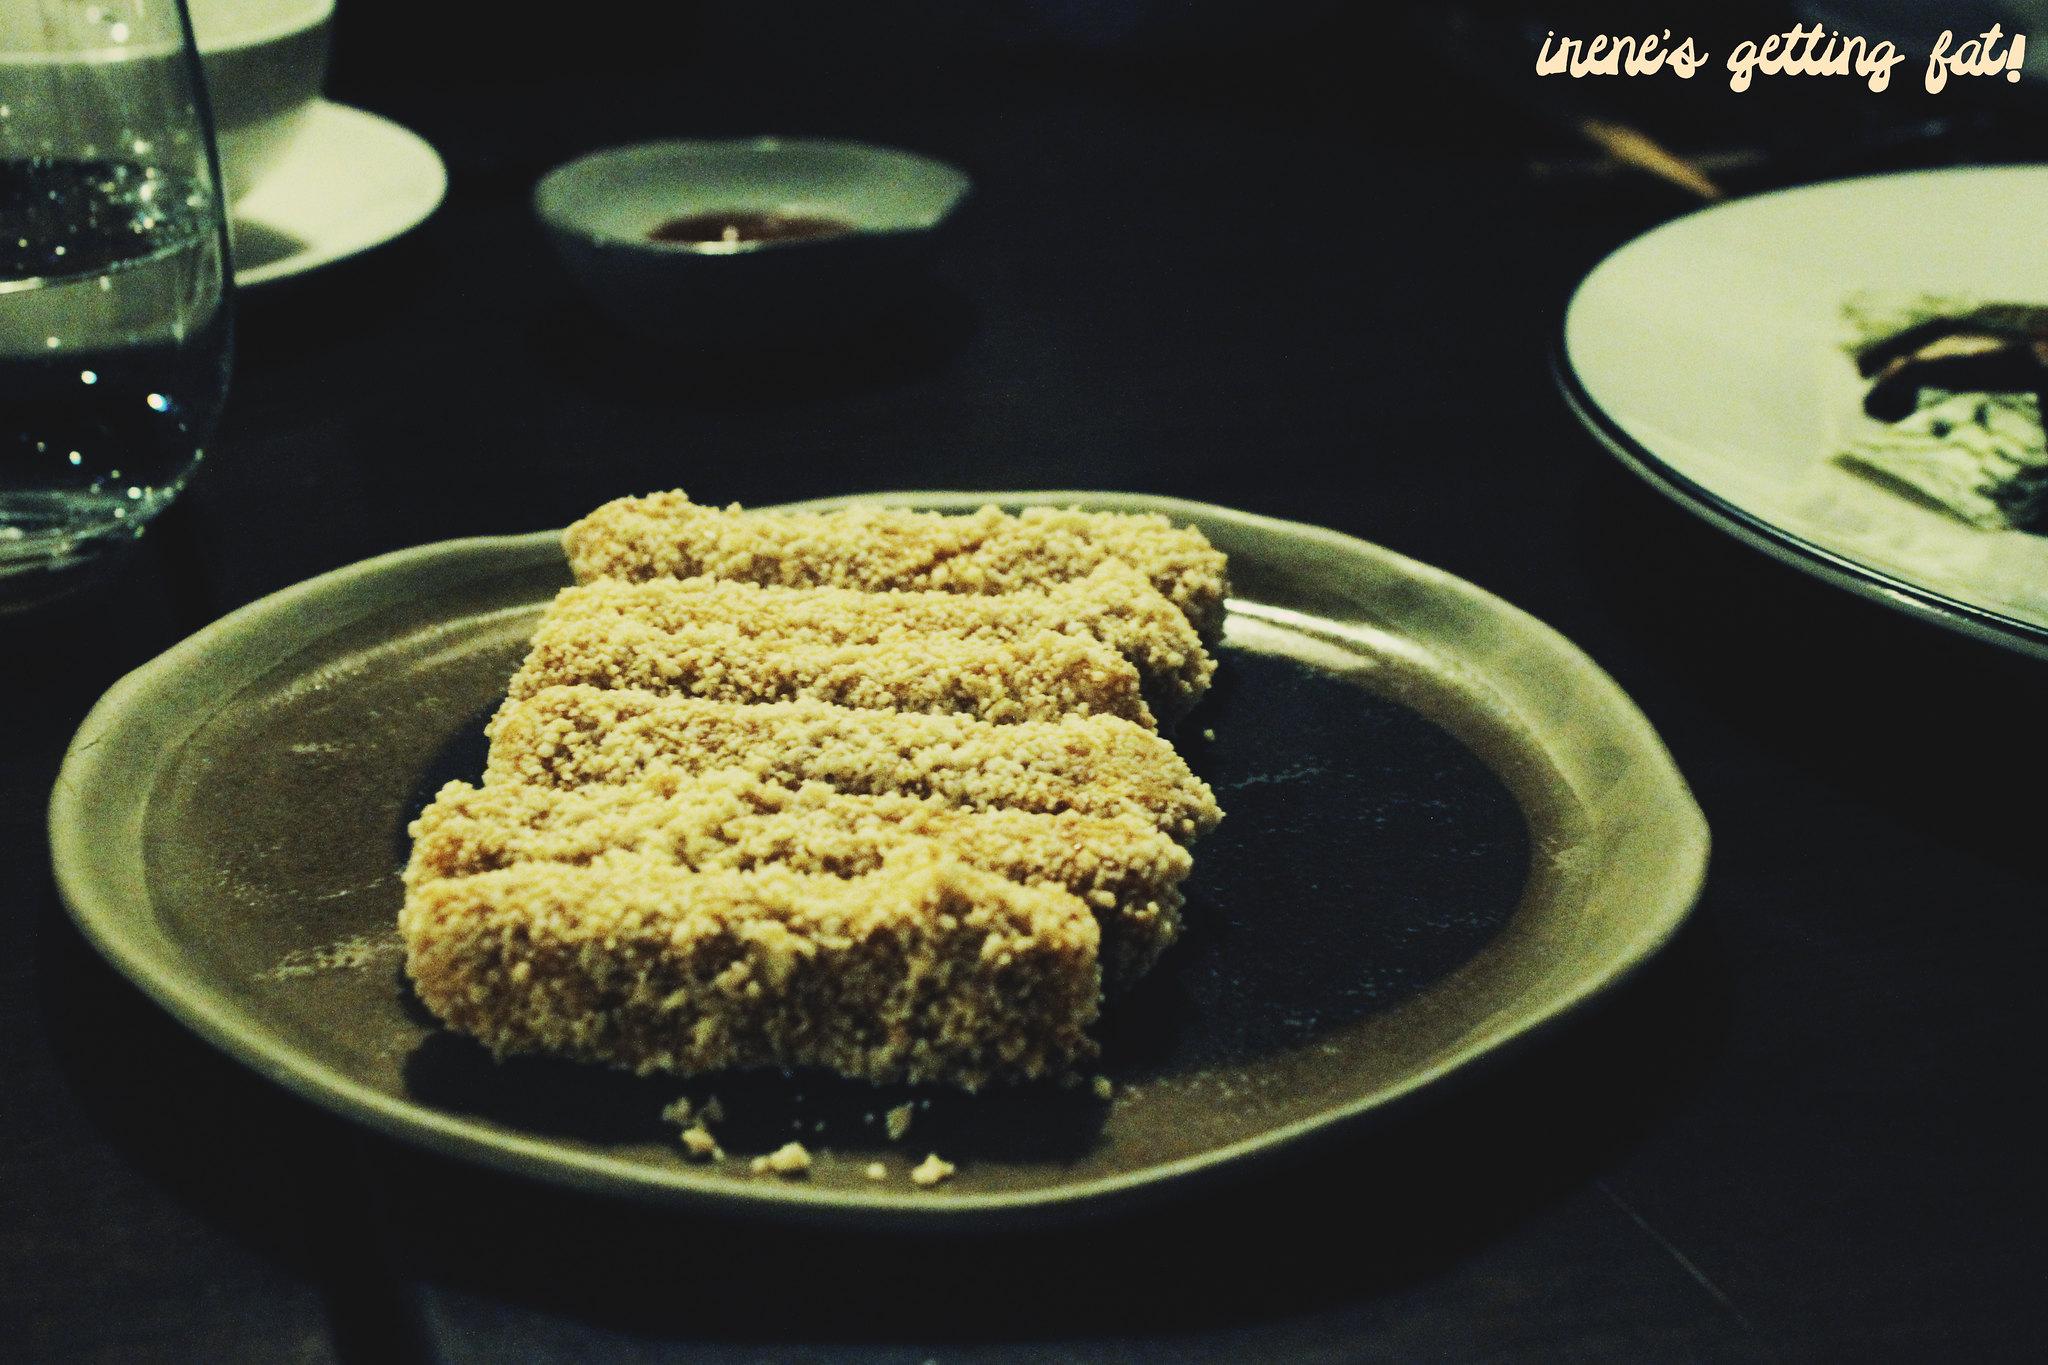 moonpark-ddeokbokki